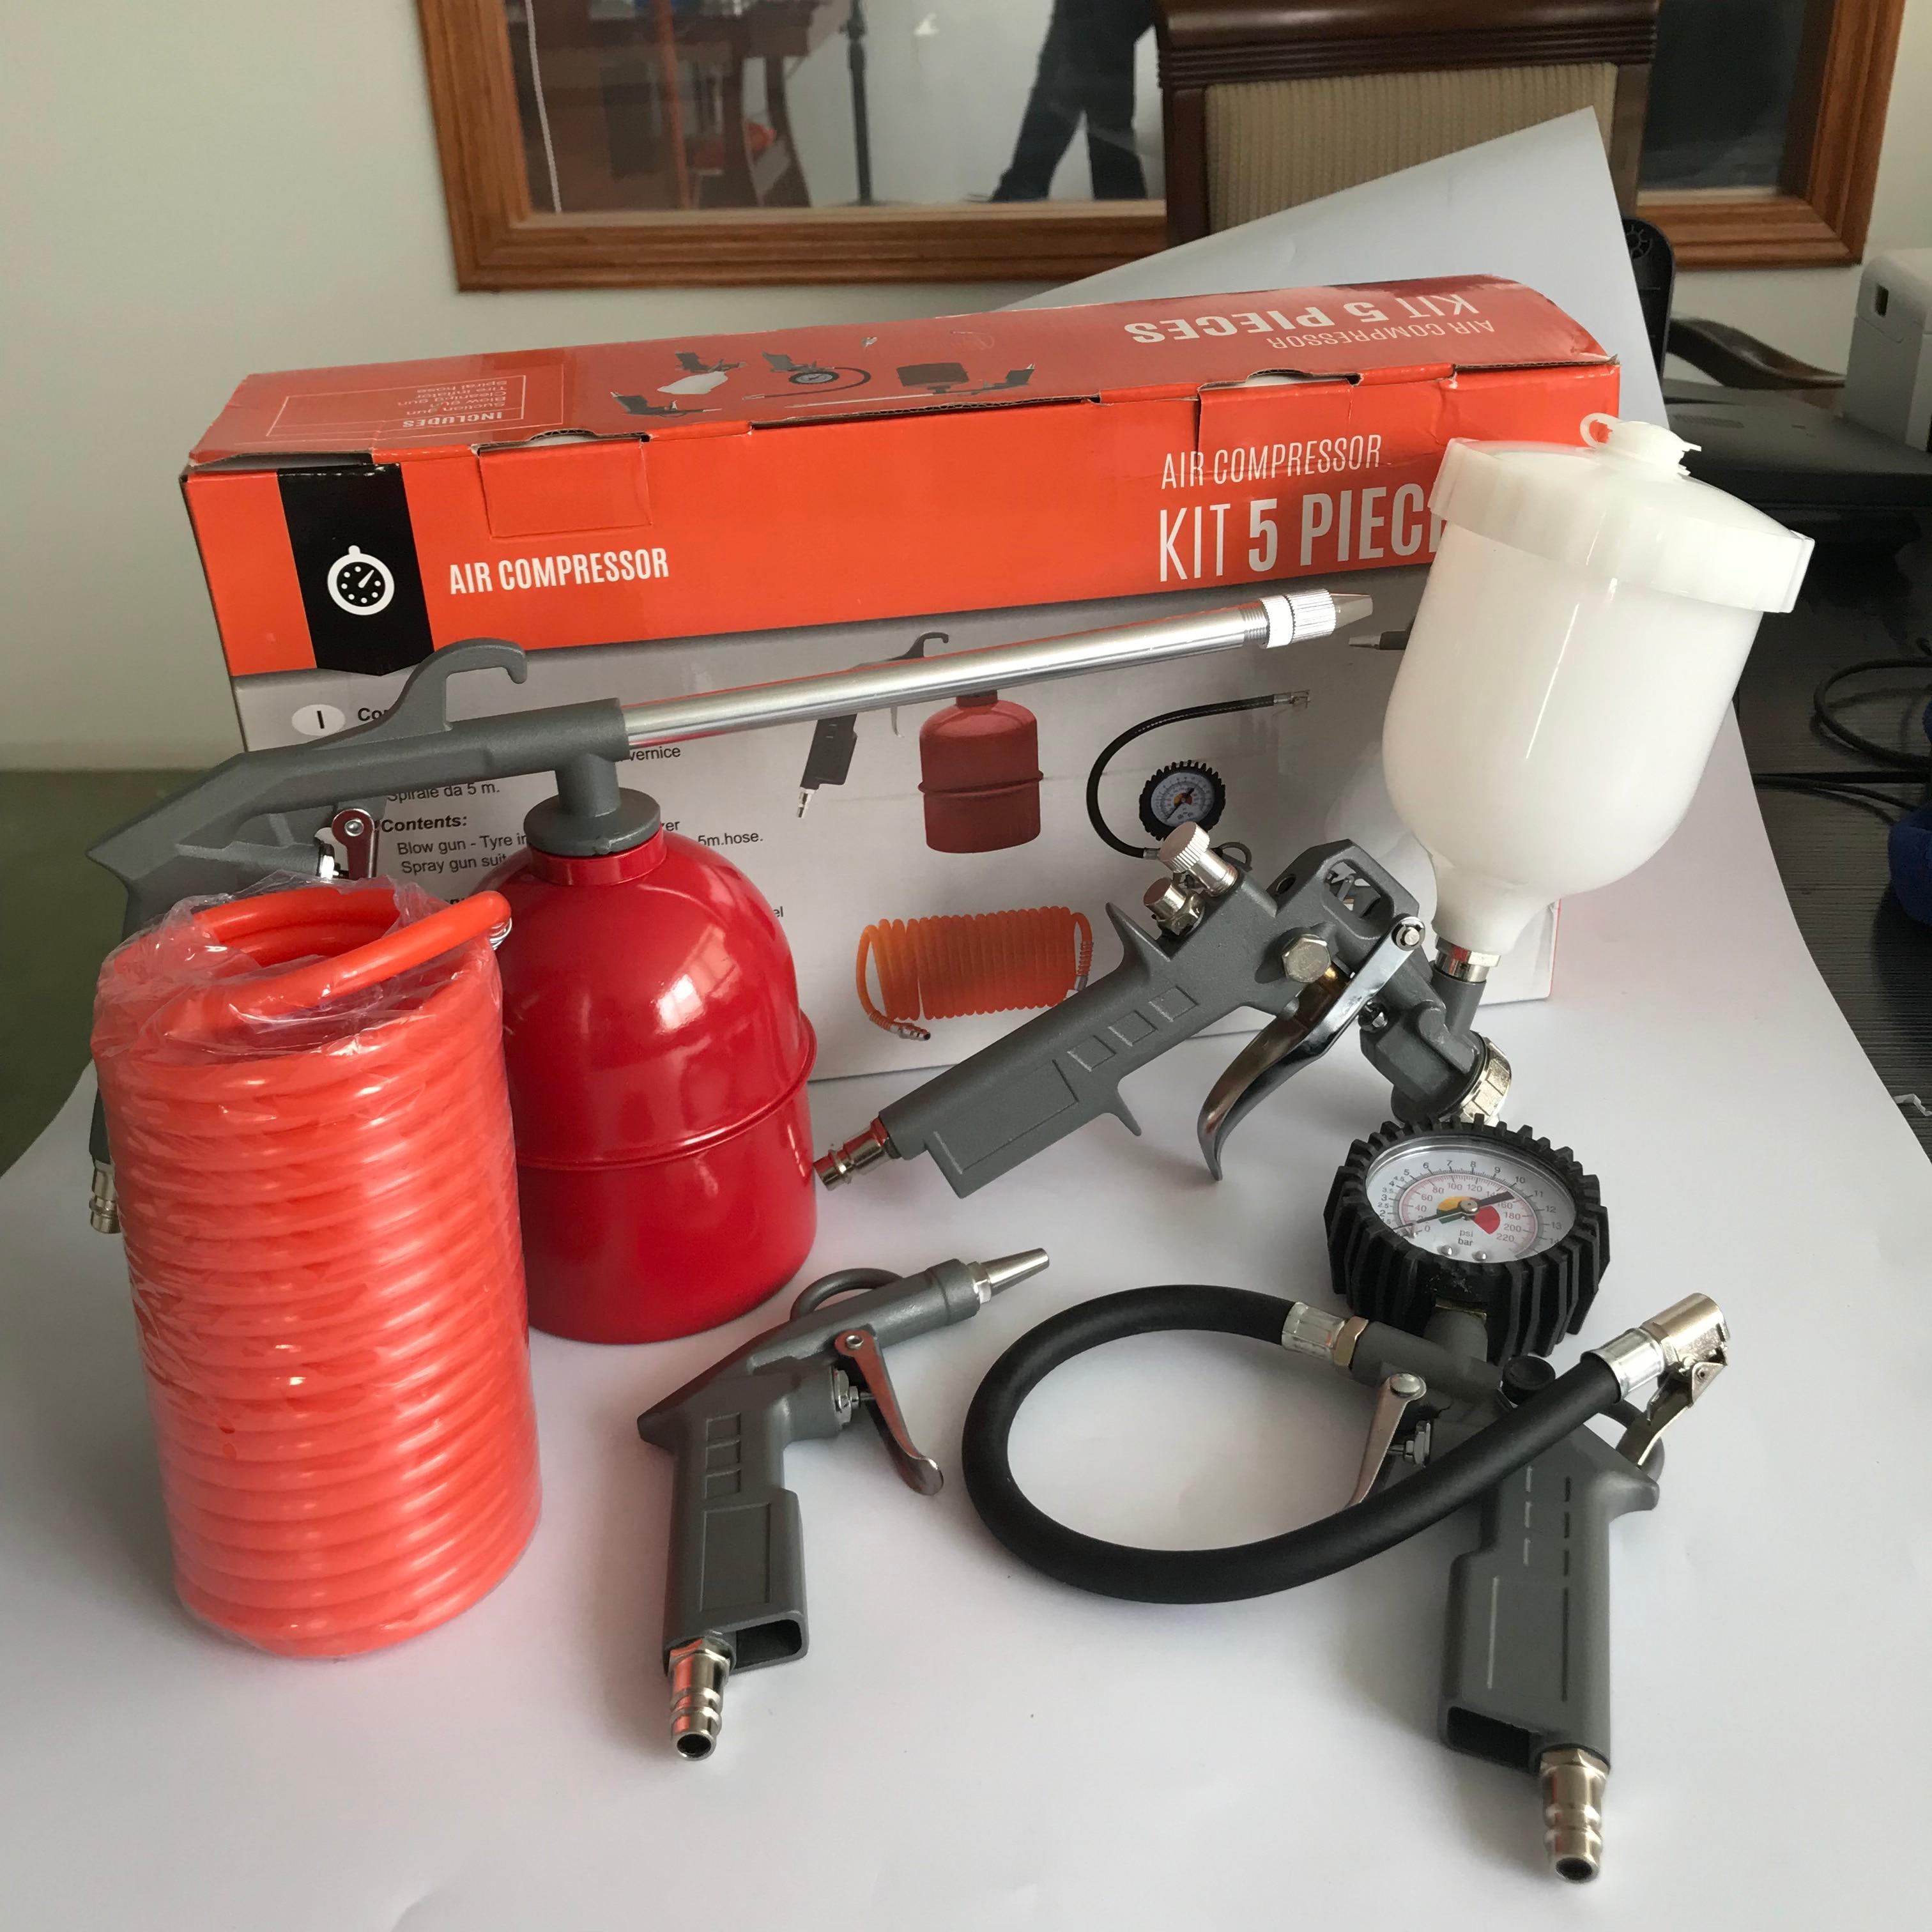 Spray Paint Gun Air Compressor Kit 5in1 Blow Gun + Tyre Inflating Gun + Atomizer Spray Gun + Clean Gun + 5M Hose USA 2-5days